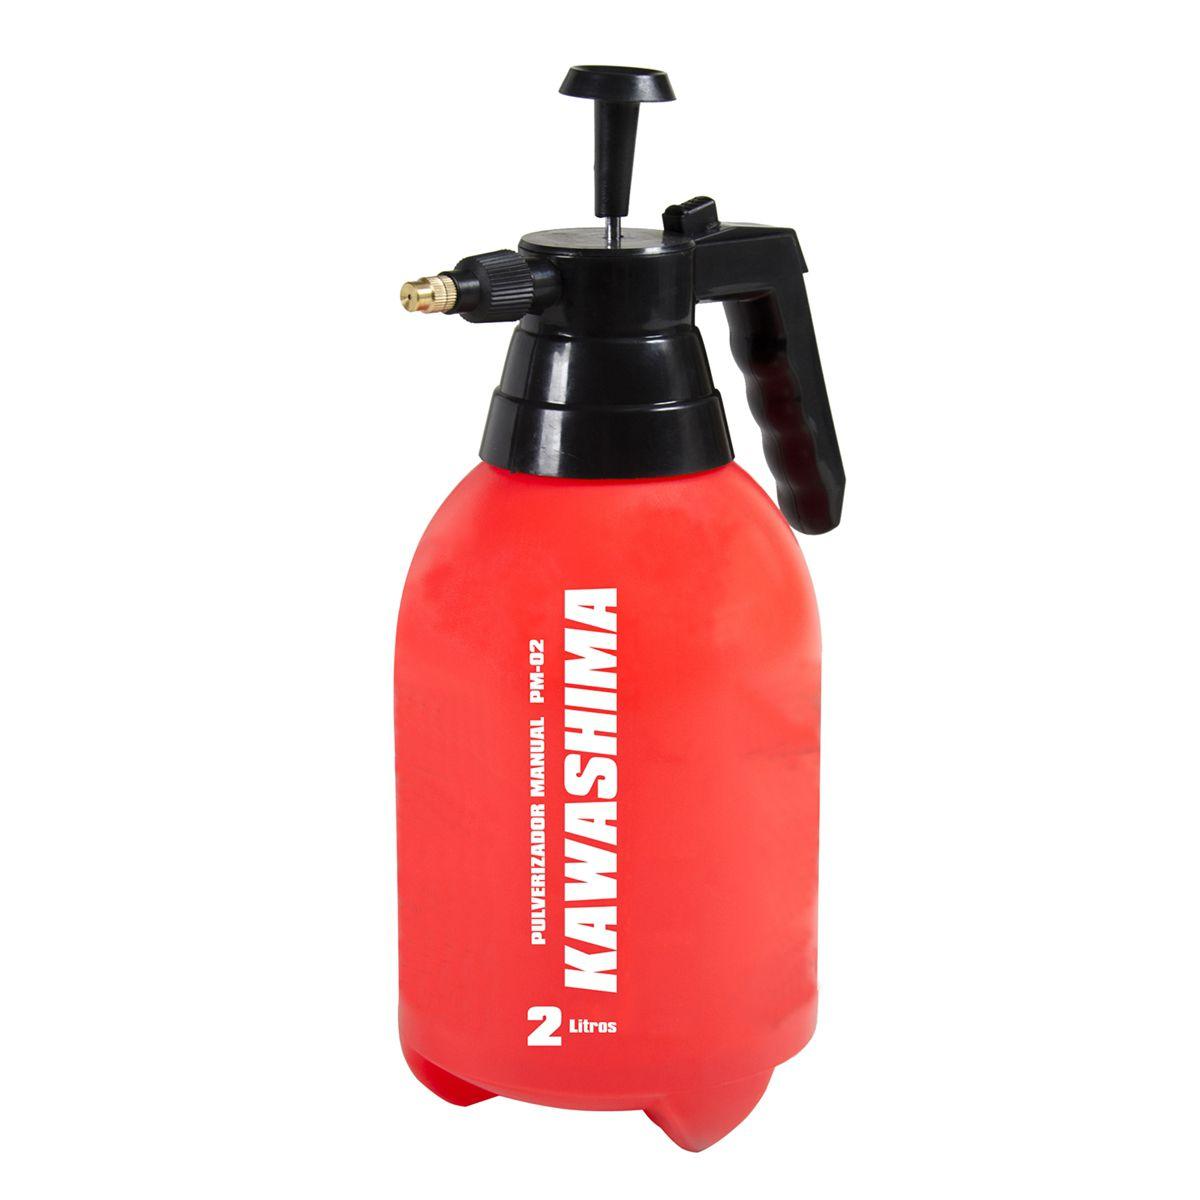 Pulverizador e Borrifador De Pressão Acumulada 2l Kawashima Kit C/ 5 Unidades